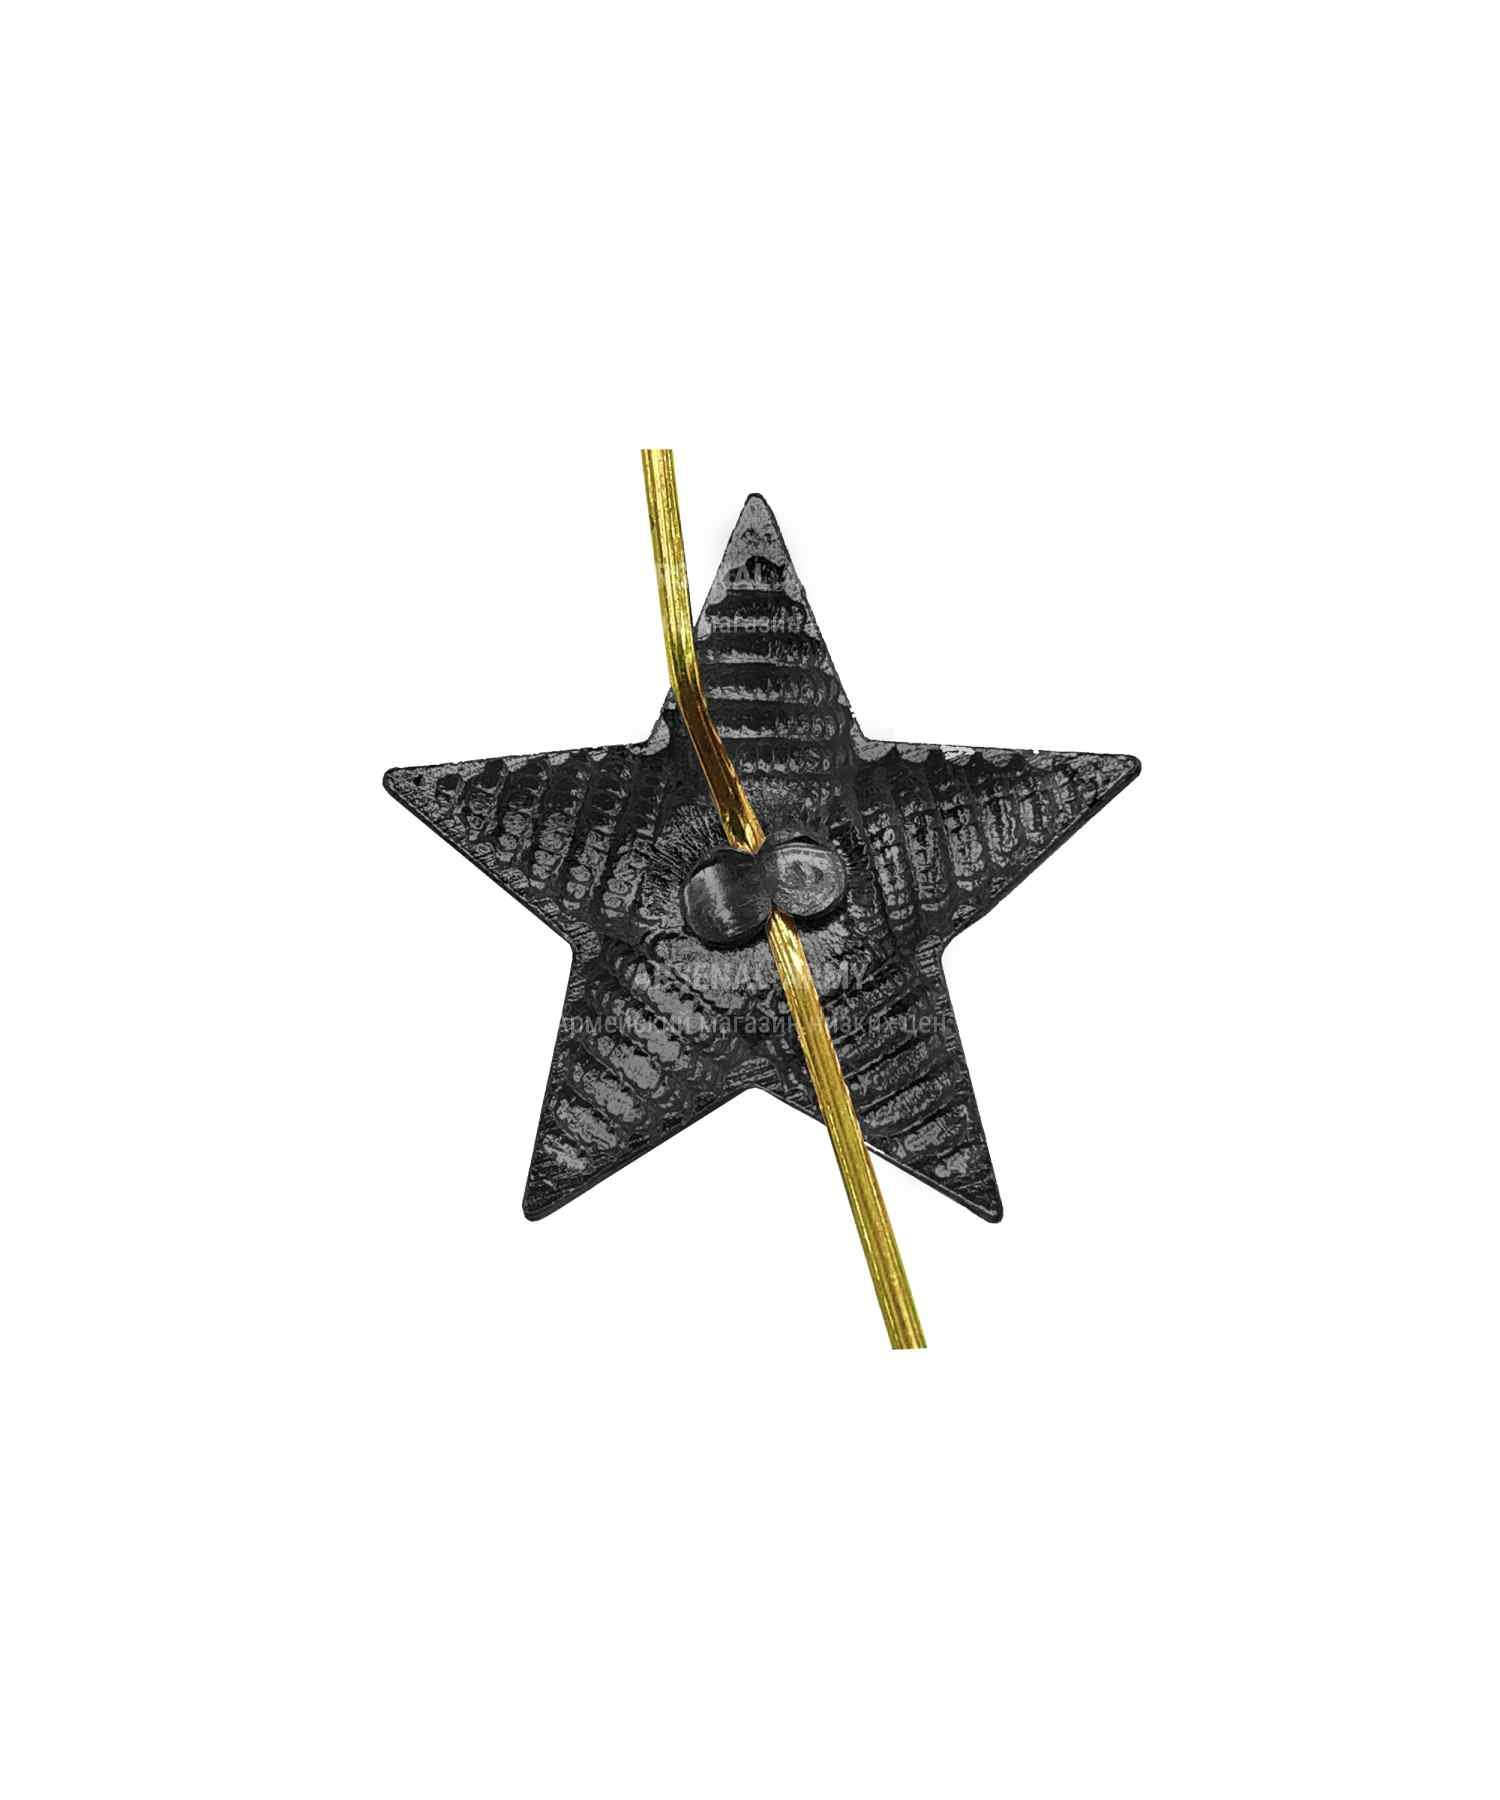 Звезда на погоны рифленая ФСИН черная 18 мм